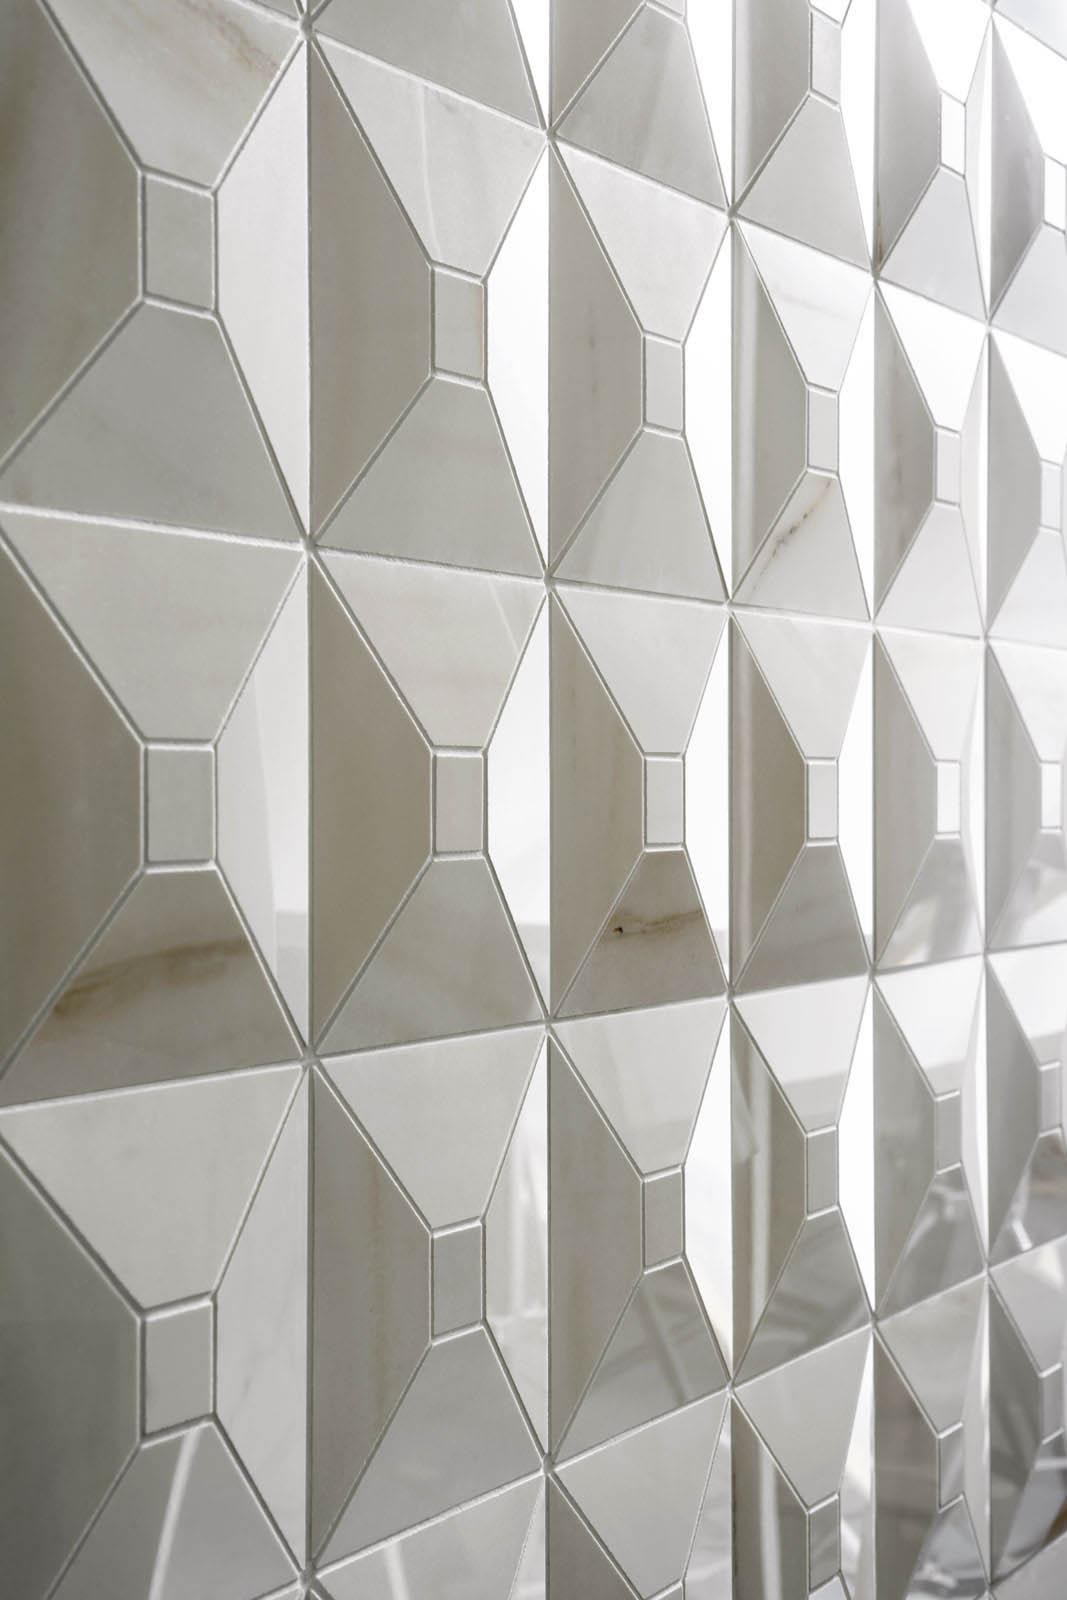 allmarble azulejos de cermica marazzi